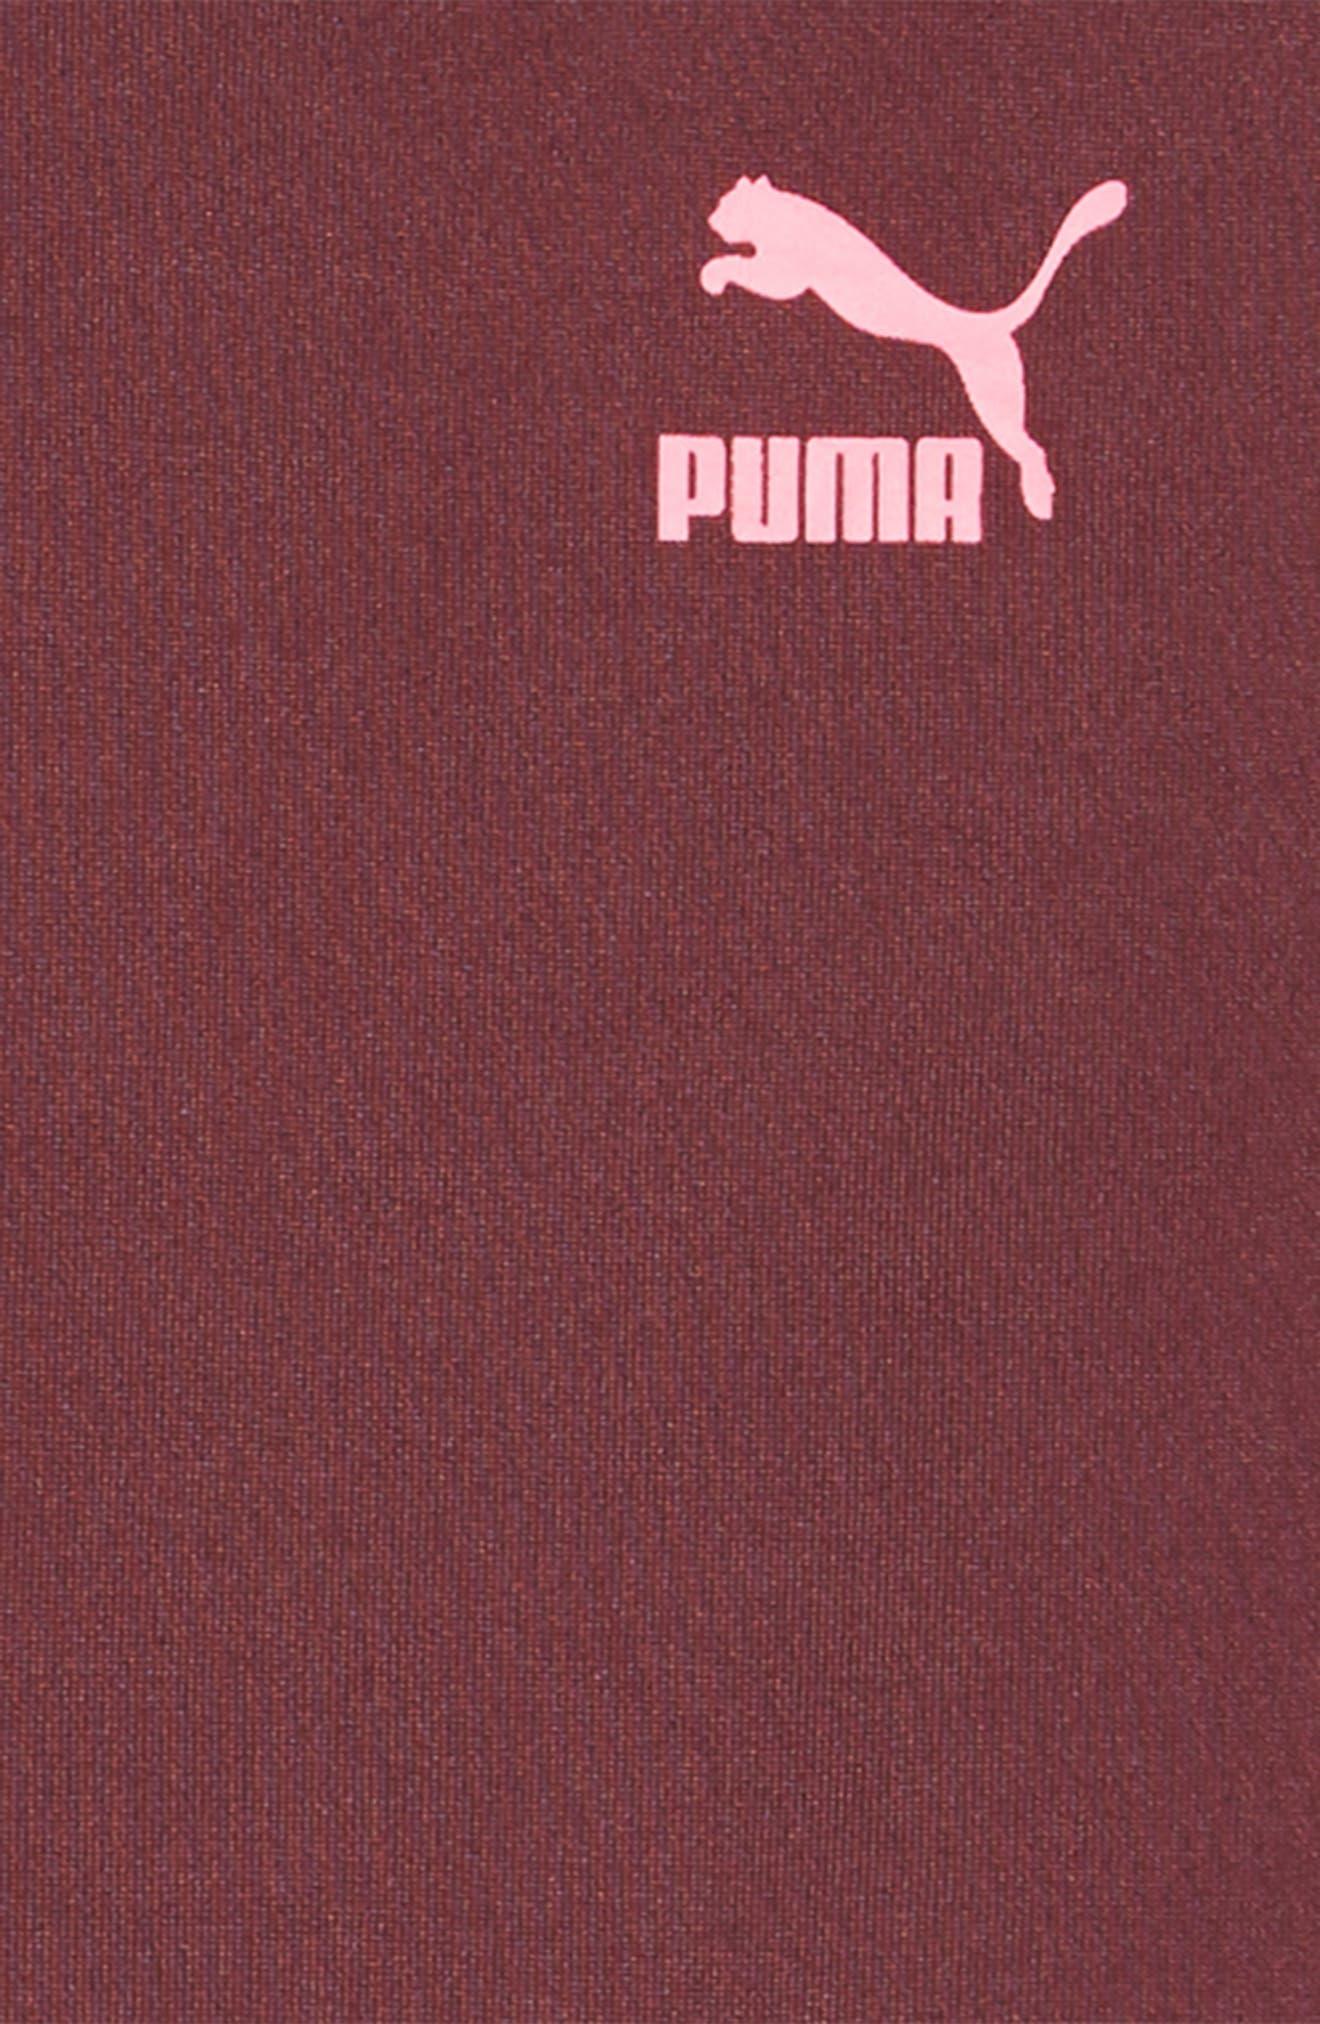 PUMA,                             Oversized Hooded Sweatshirt Dress,                             Alternate thumbnail 3, color,                             597